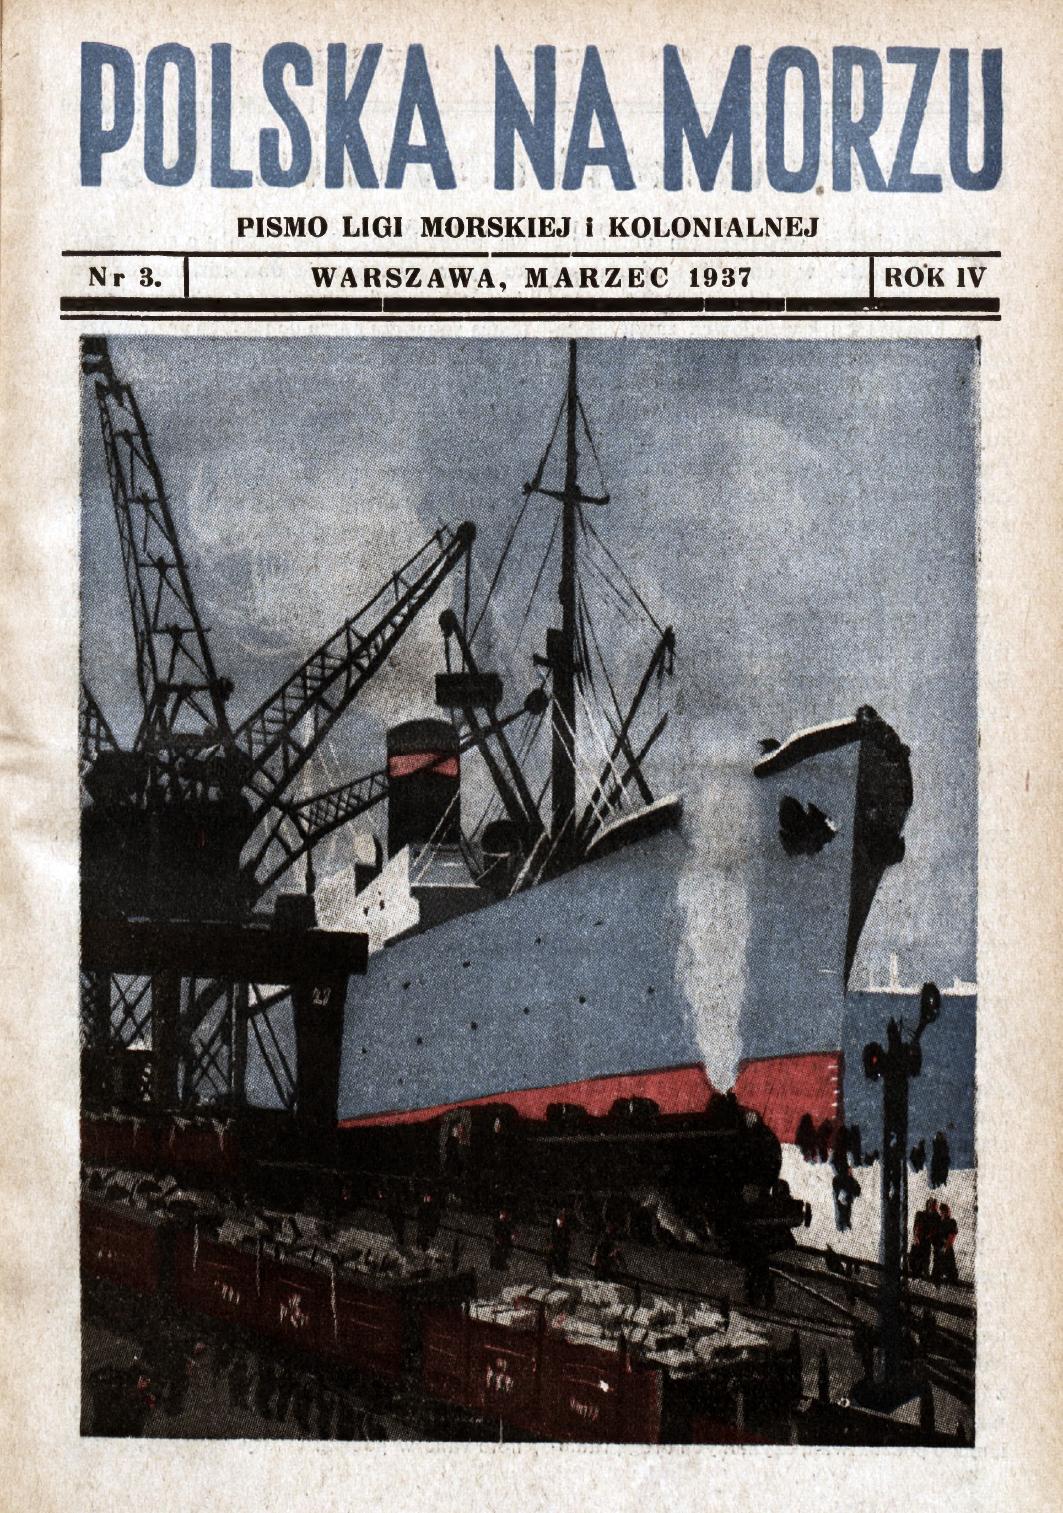 Polska na Morzu : pismo Ligi Morskiej i Kolonjalnej. - Liga Morska i Kolonjalna, 1937, nr 3